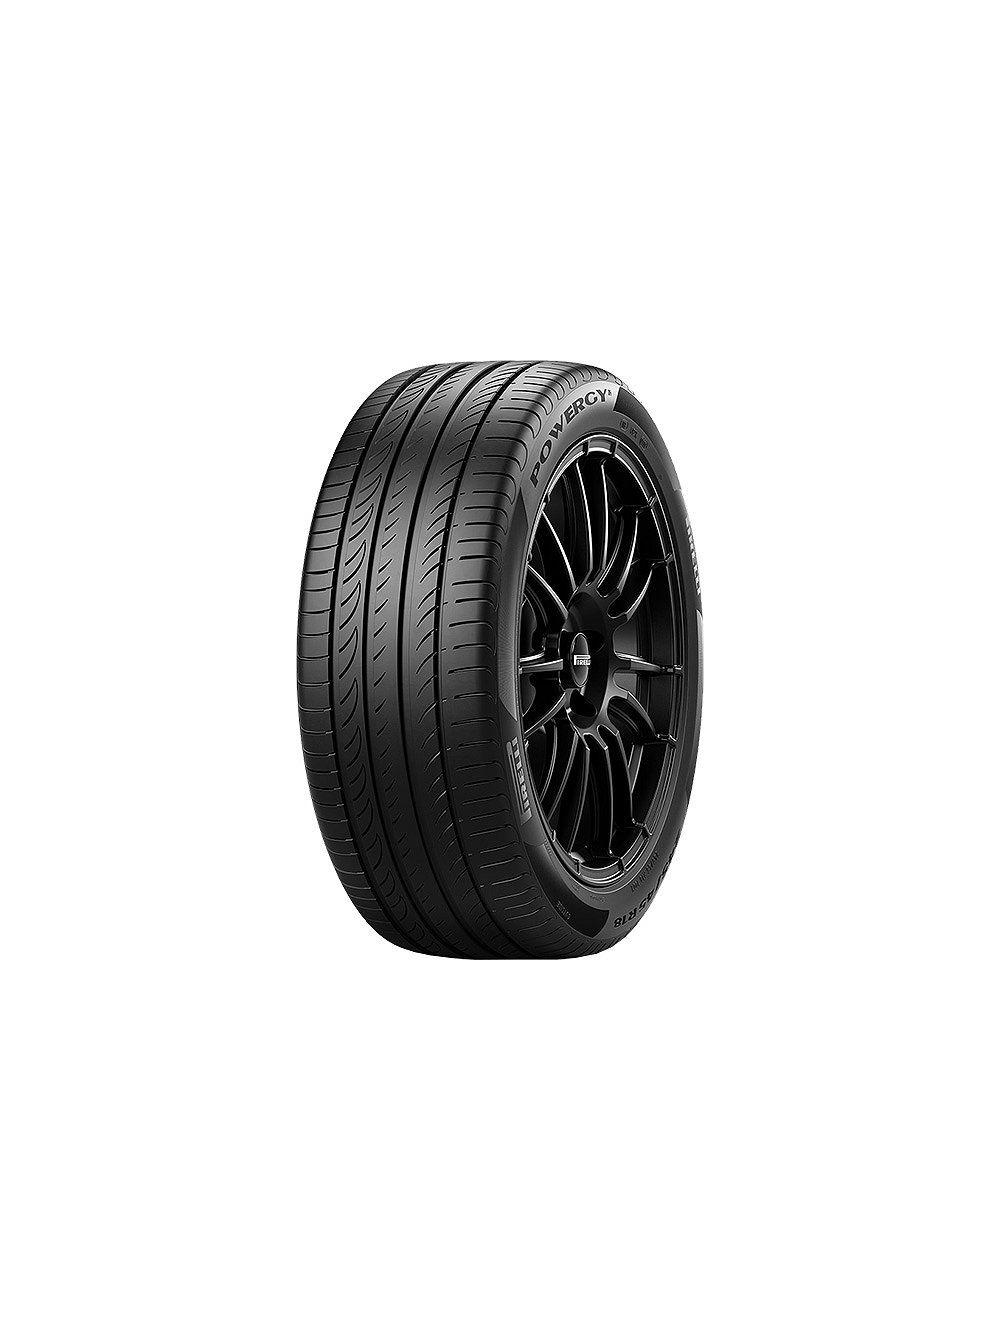 Pirelli 245/45R18 Y Powergy XL Nyári gumi